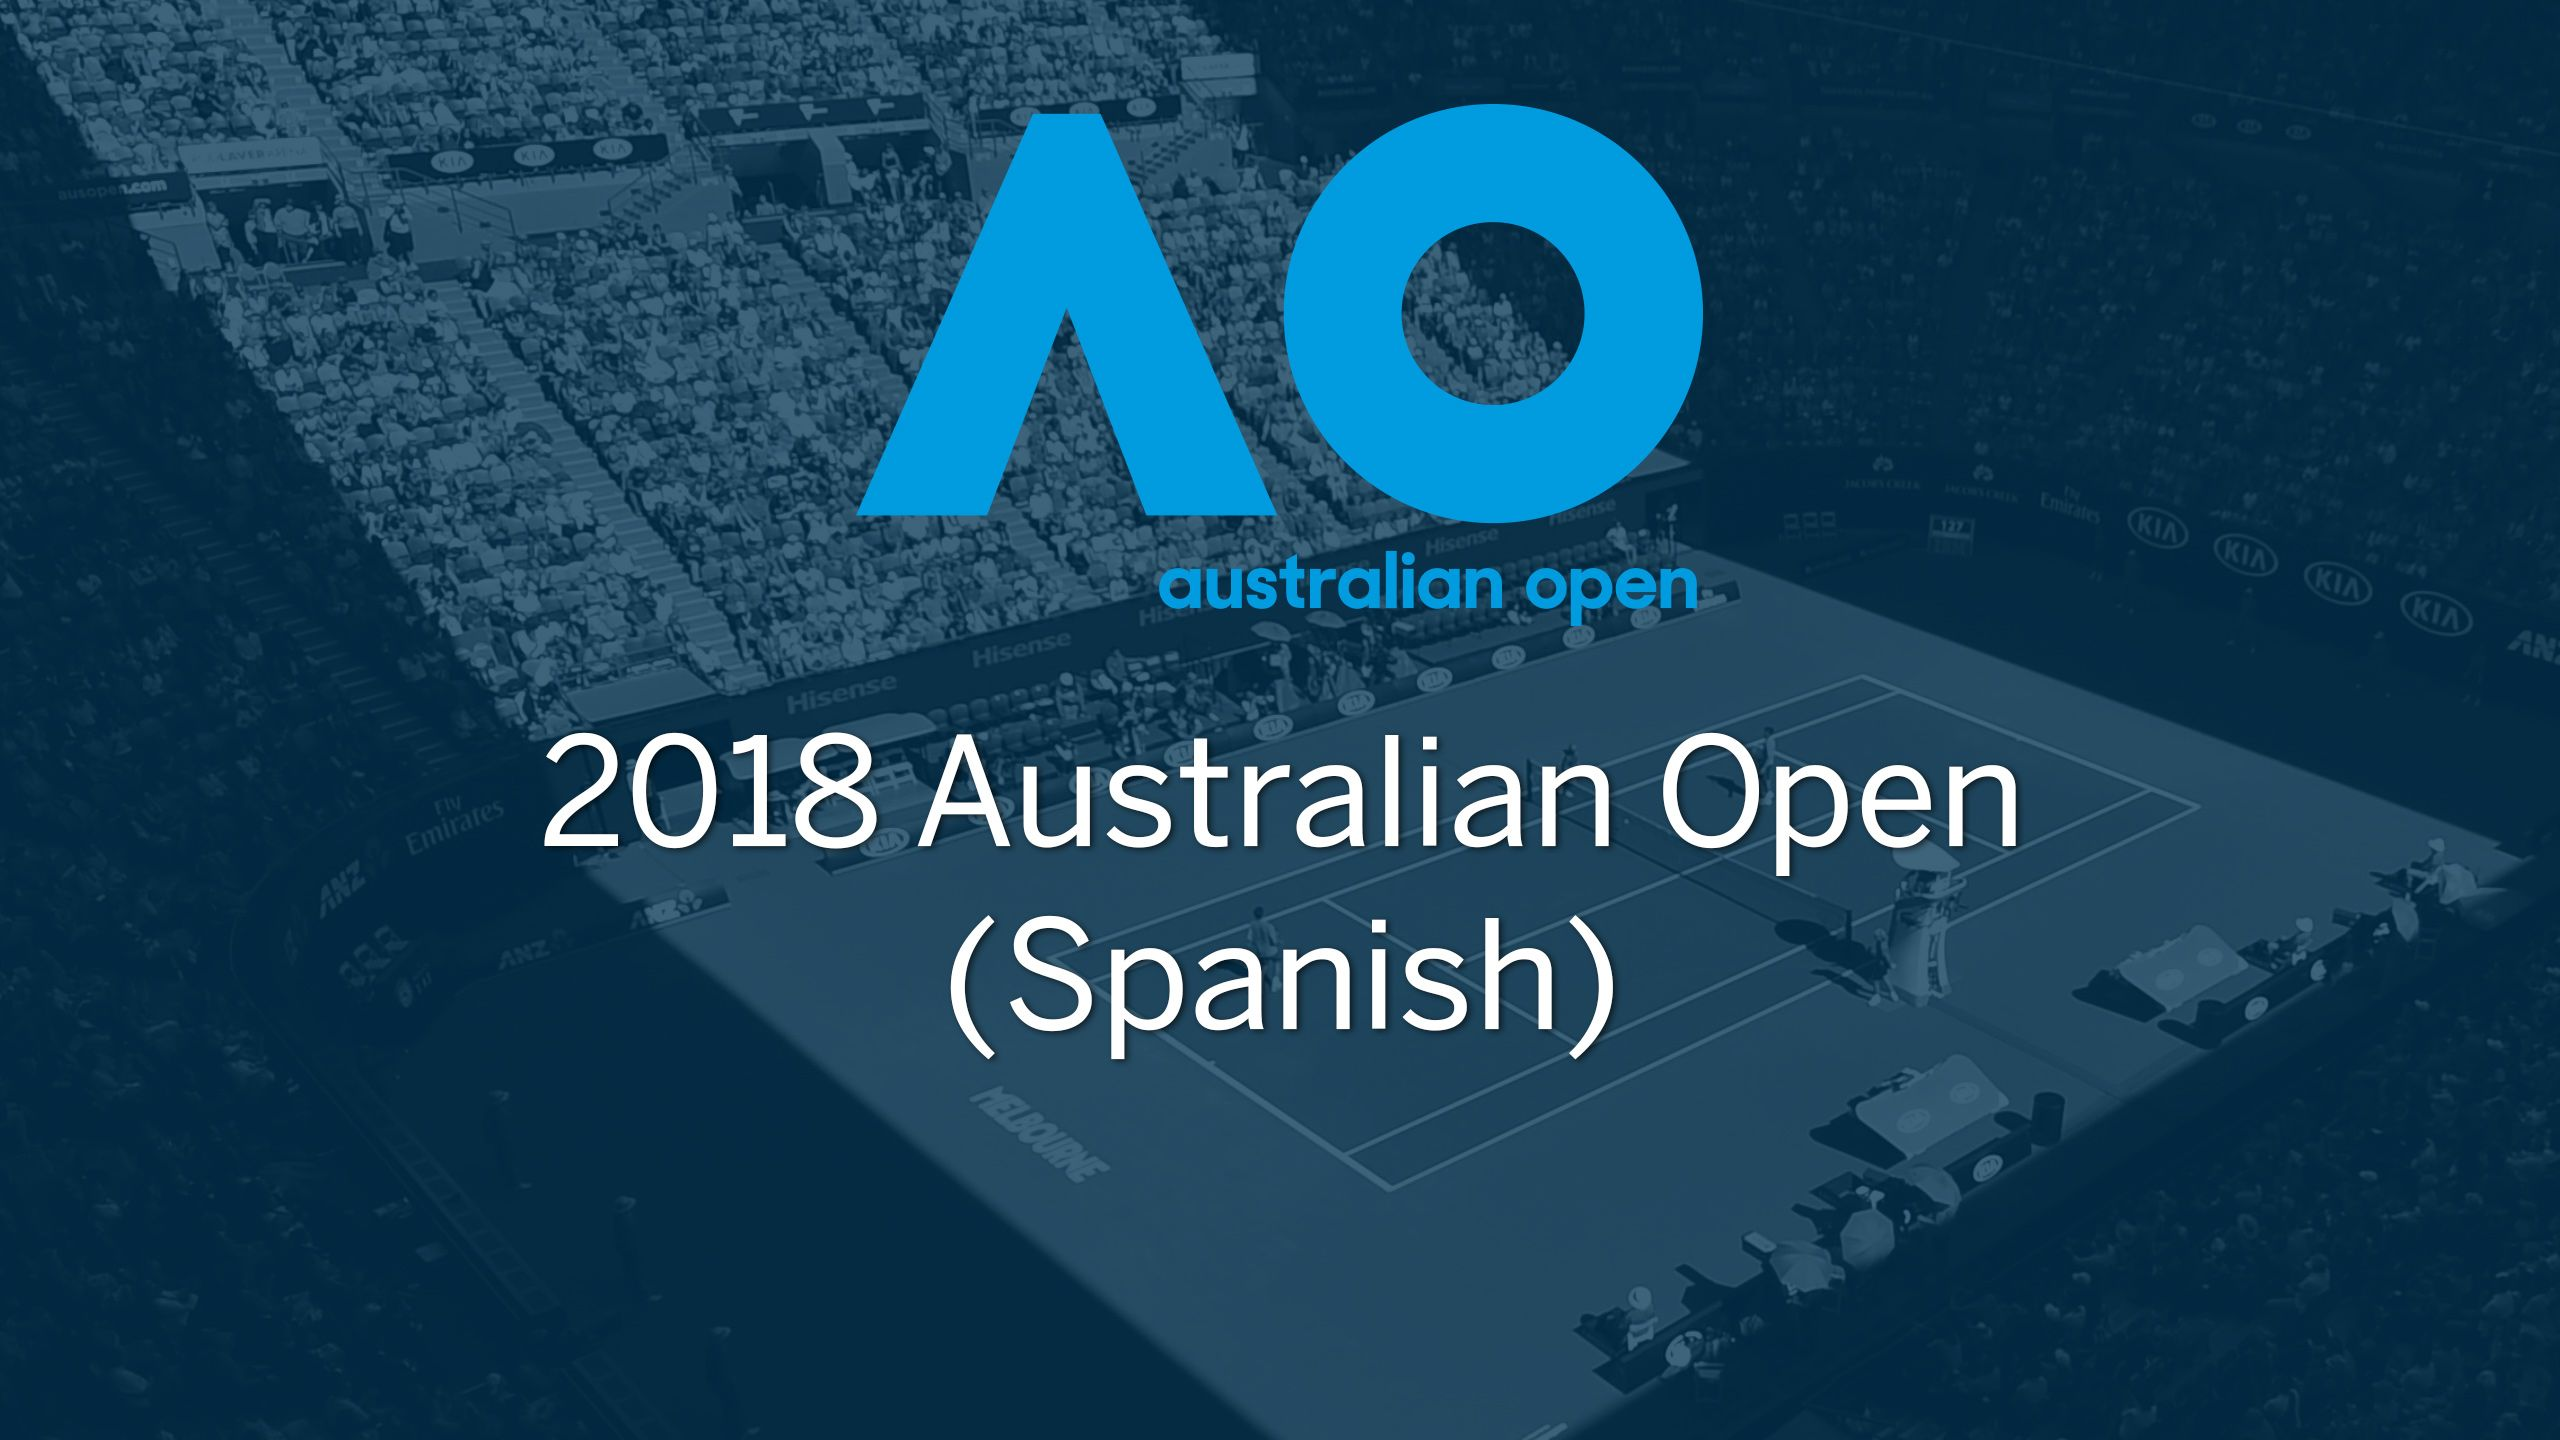 2018 Australian Open (Spanish-language)